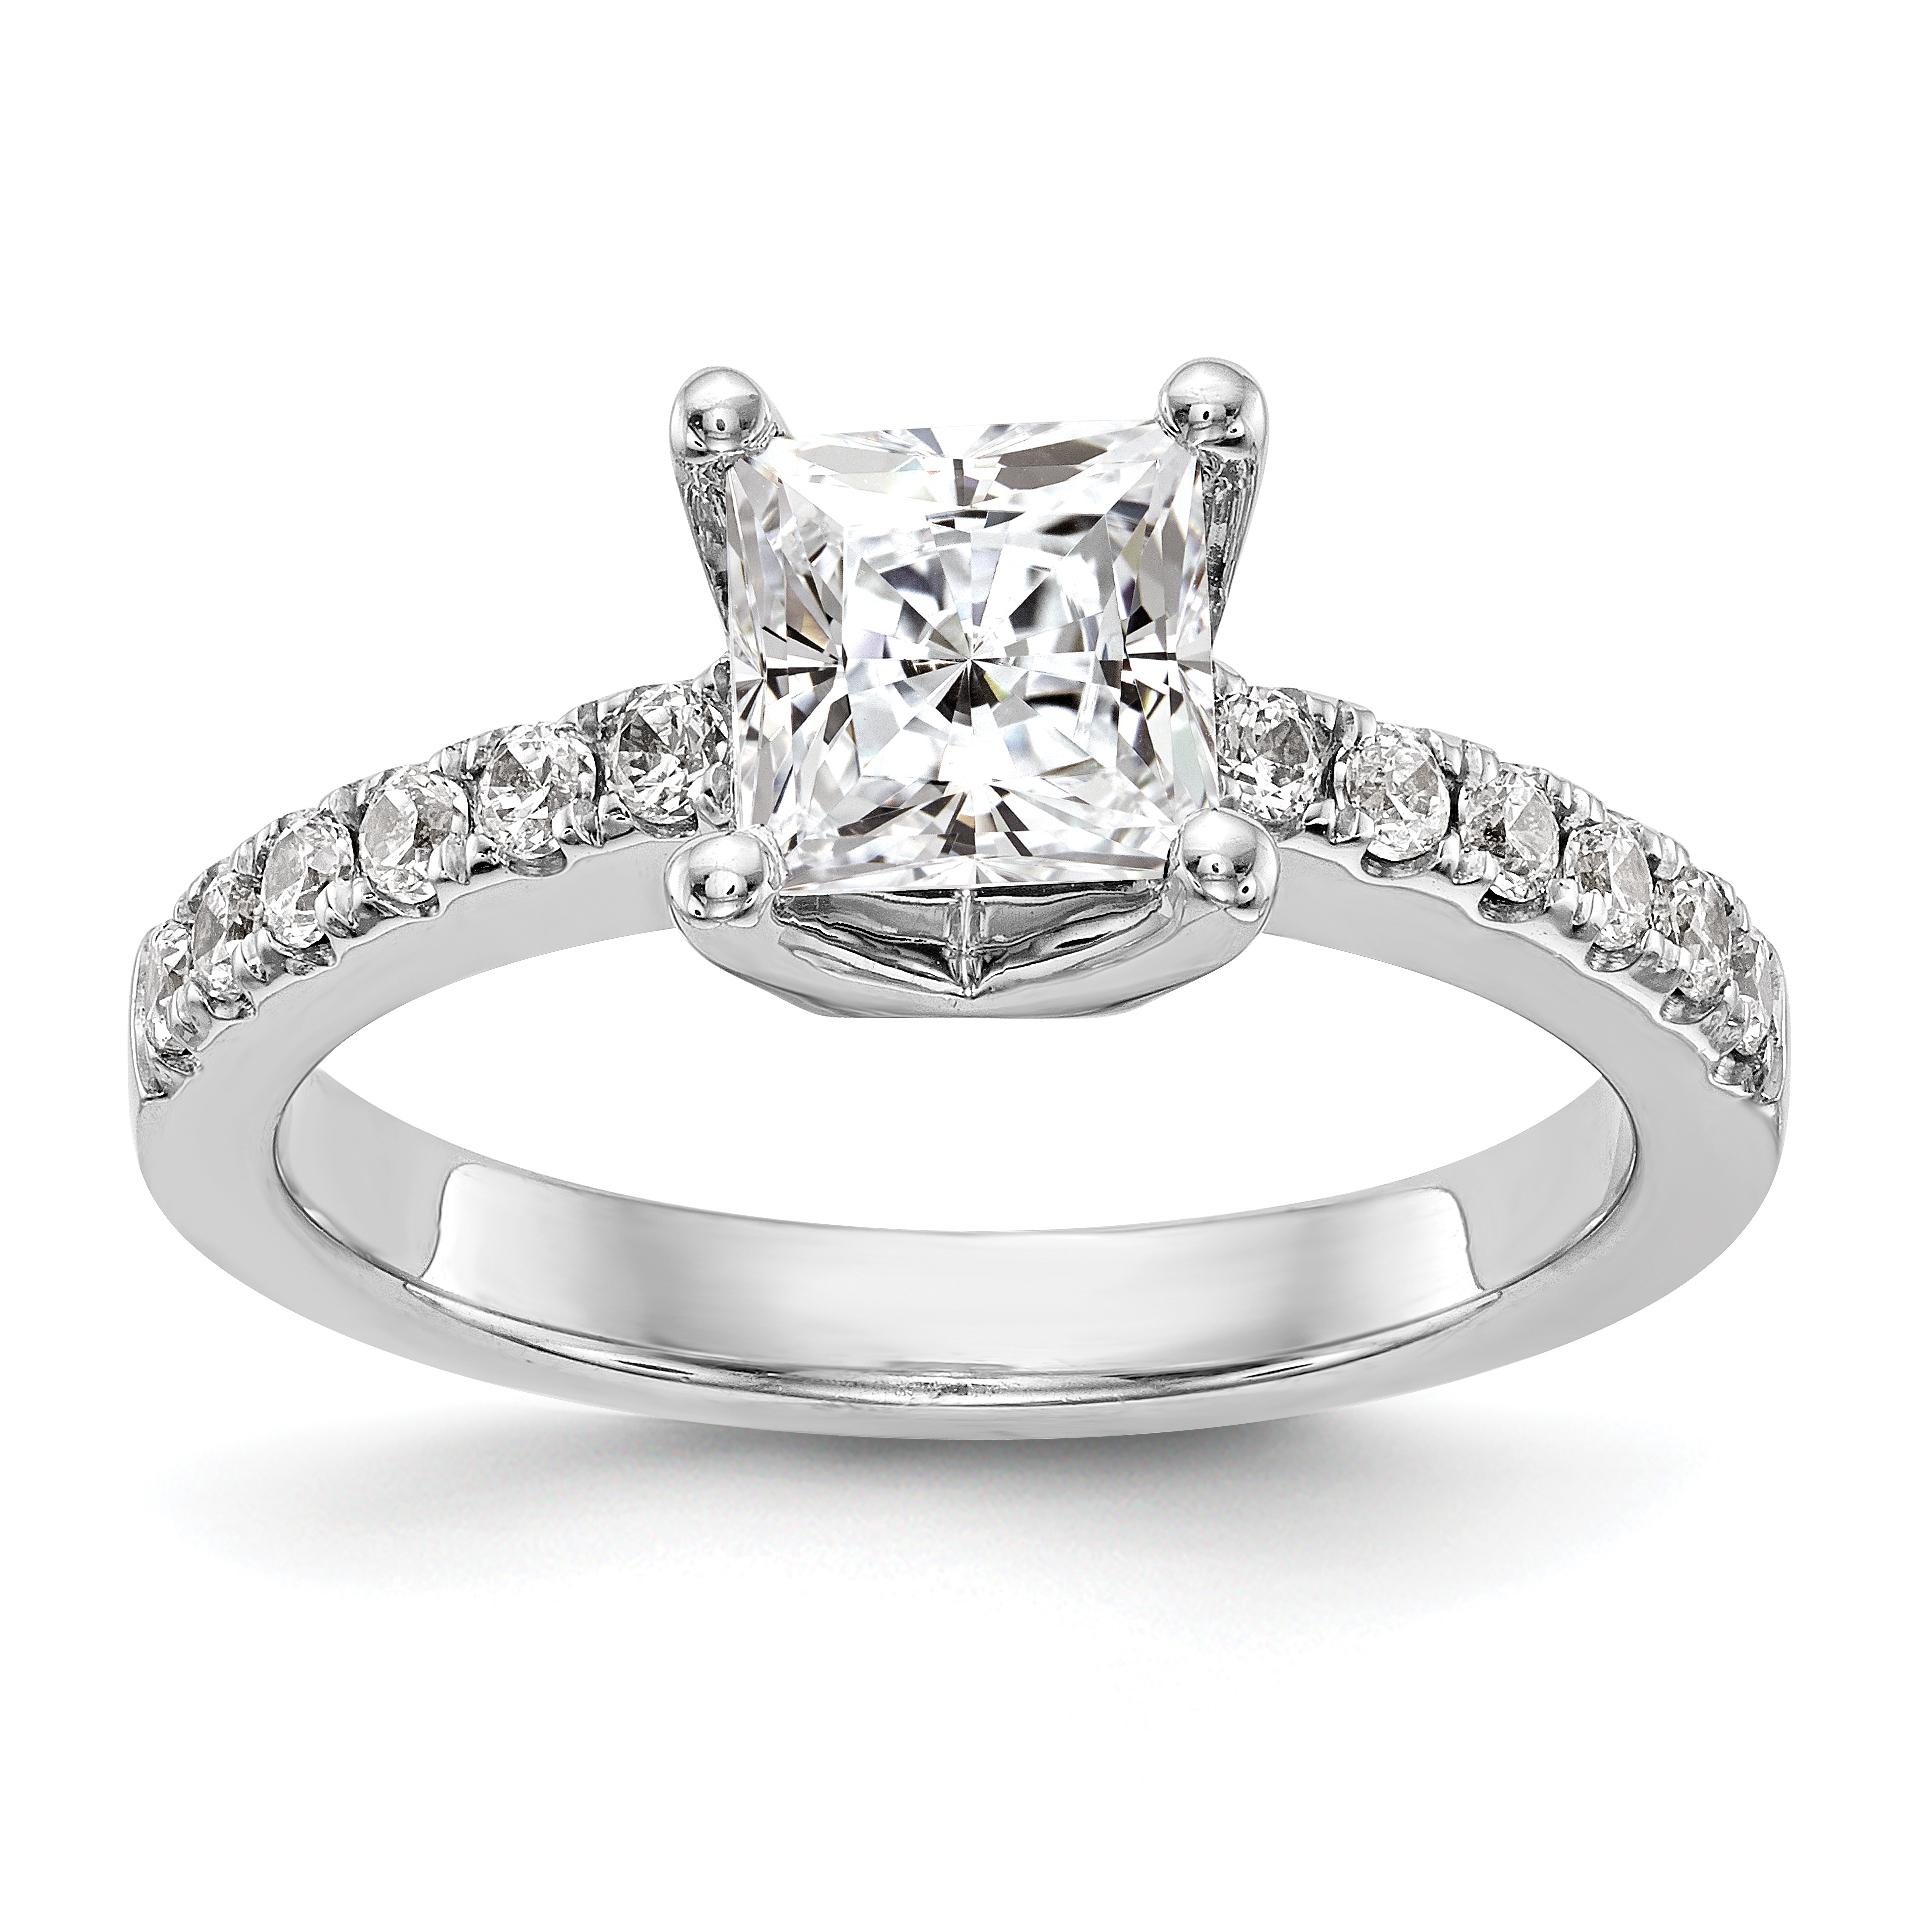 14kt White Gold True Origin Lab Grown Diamond VS/SI, D E F, Semi-Mount Engagement Ring 0.216 Carat, Ring Size 7